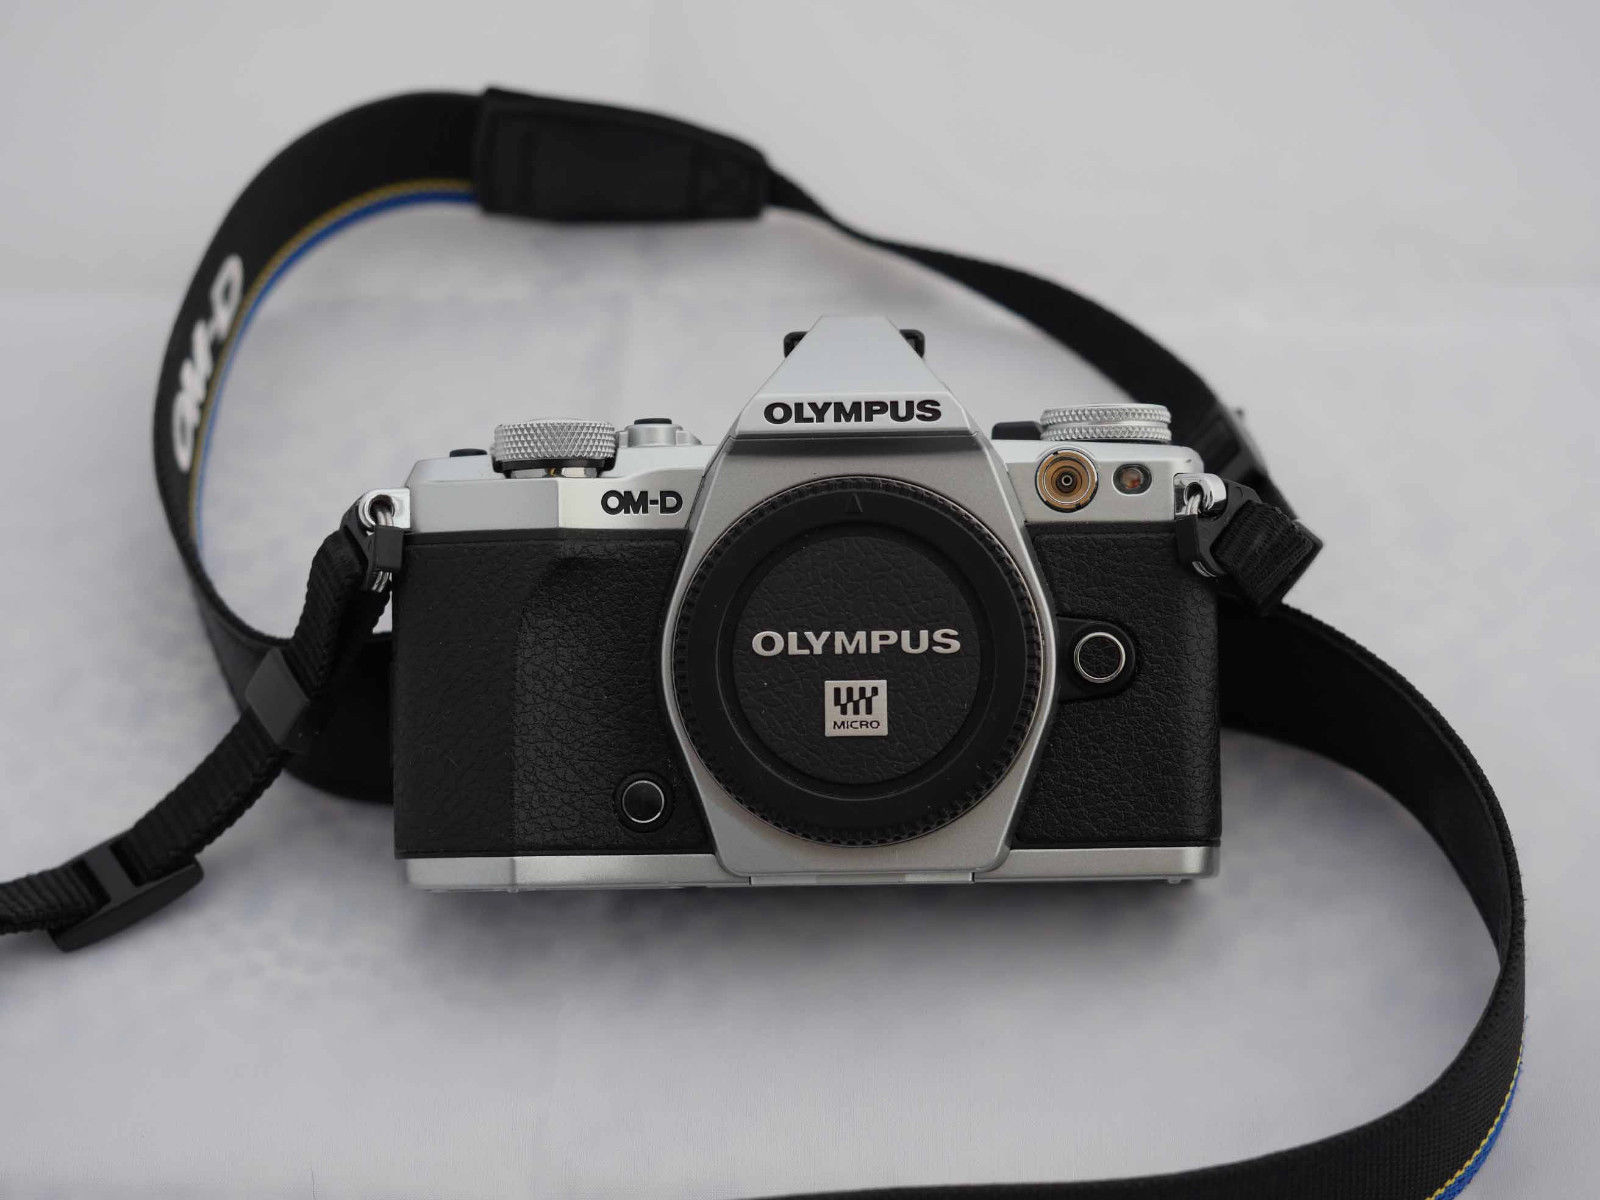 Olympus D OM-D E-M5 Mark II 16.0MP Digitalkamera - Schwarz Silber nur Gehäuse